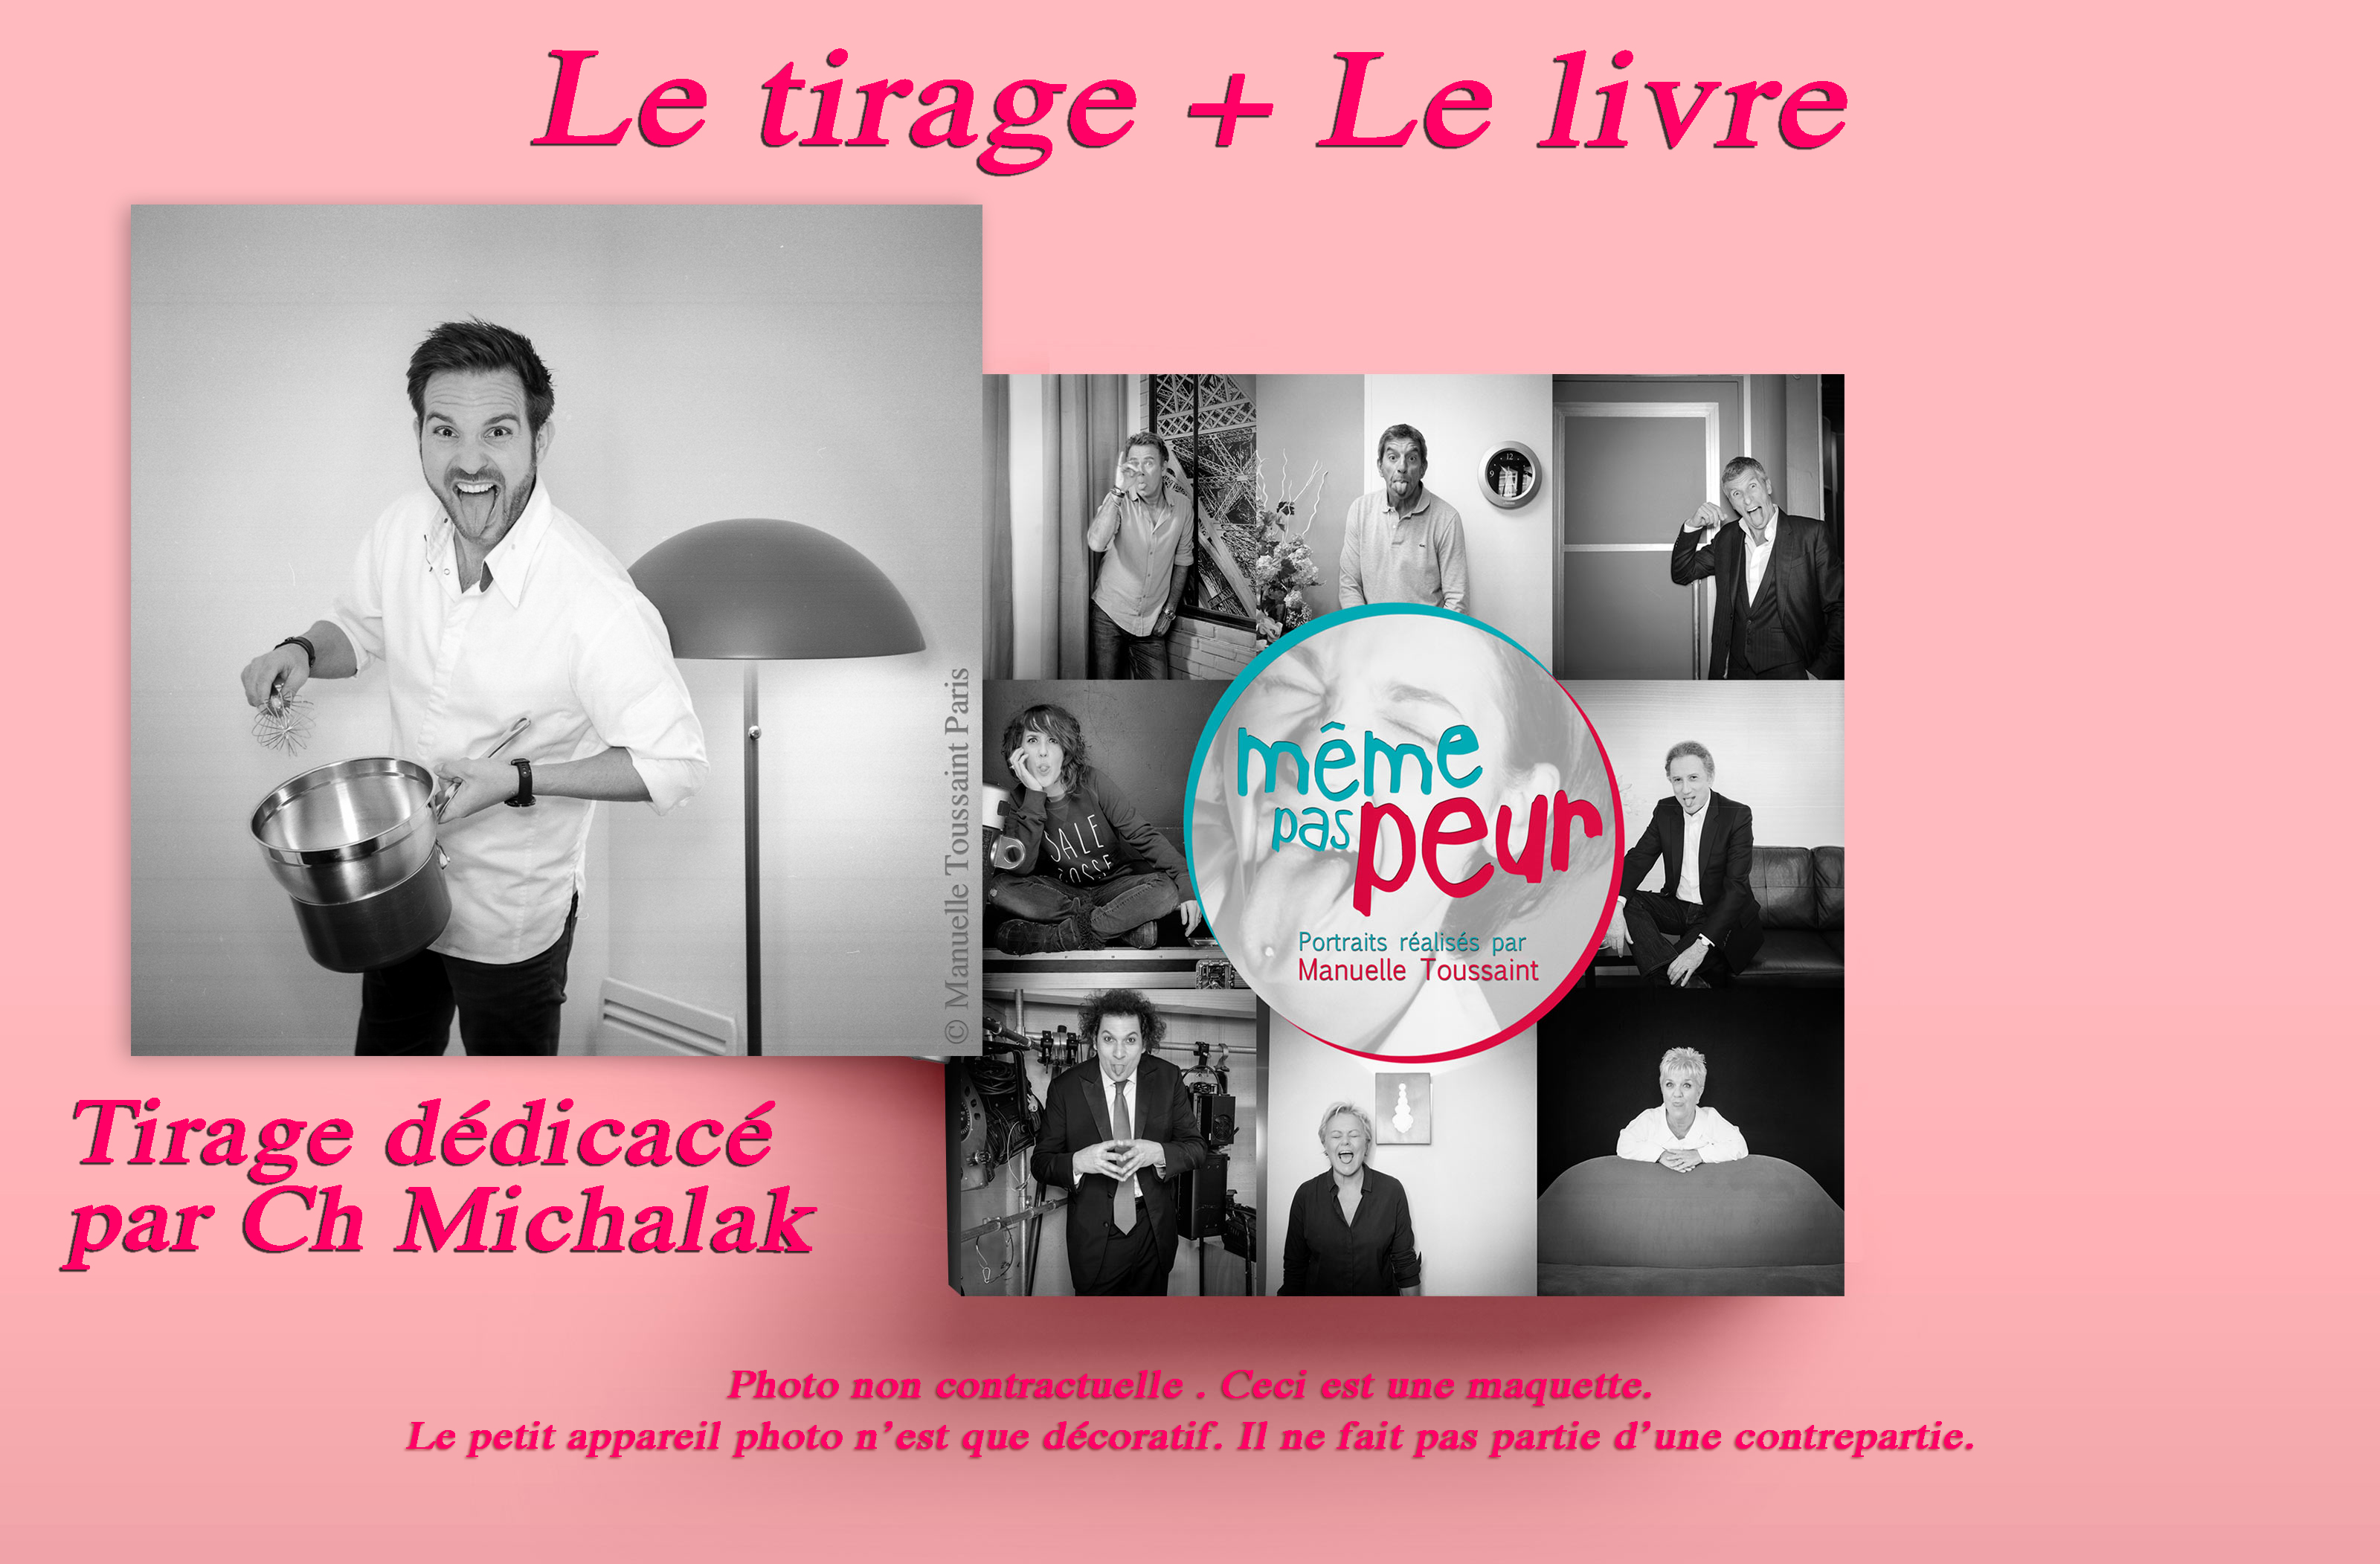 Tirage_Michalak_dedicace_livre-1497101105.jpg